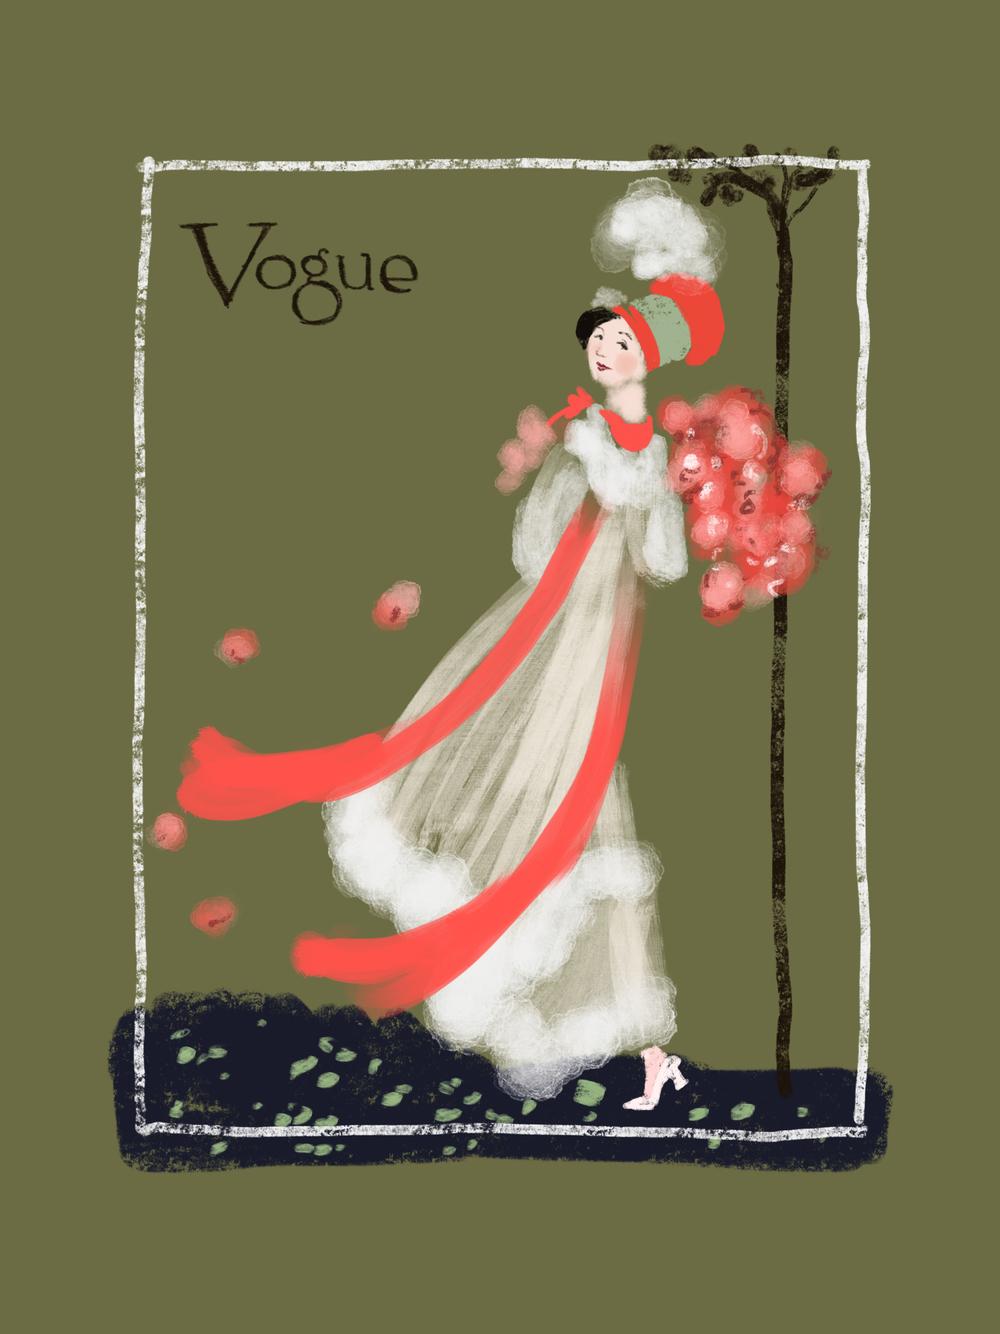 VINTAGE VOGUE COVER SERIES